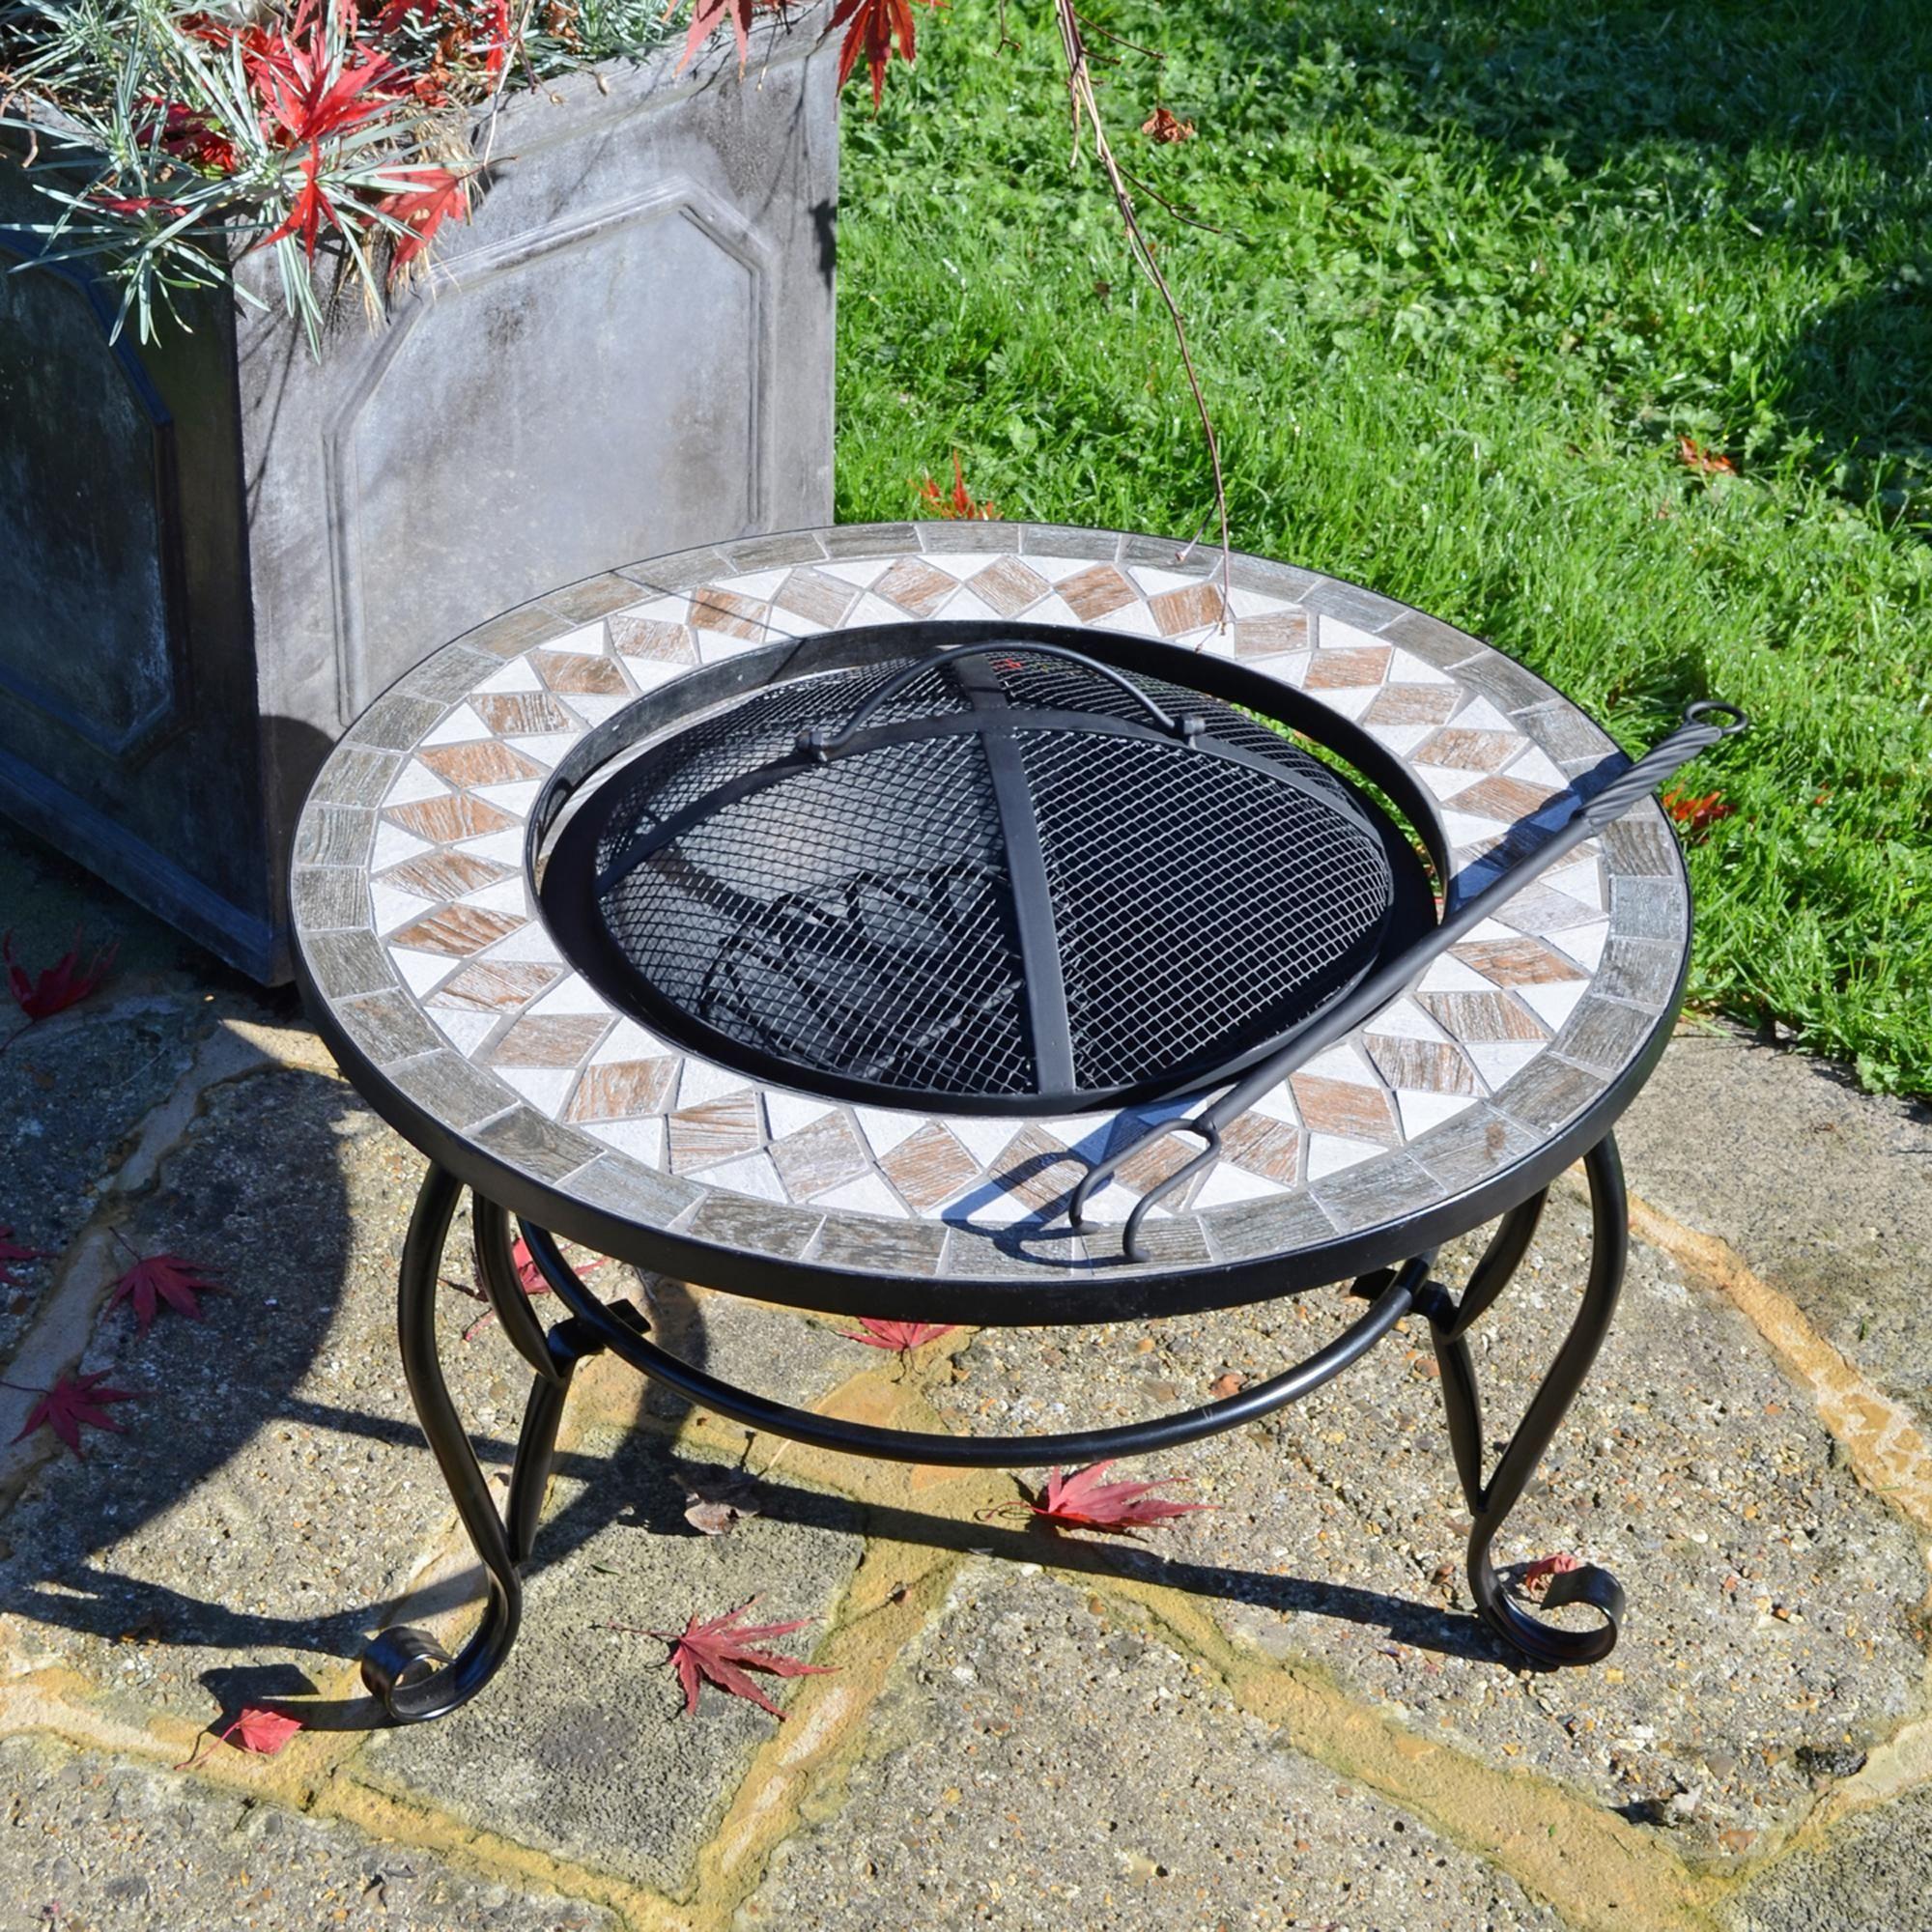 Summer Terrace Brava Low Fire Pit In 2020 Fire Pit Table Wood